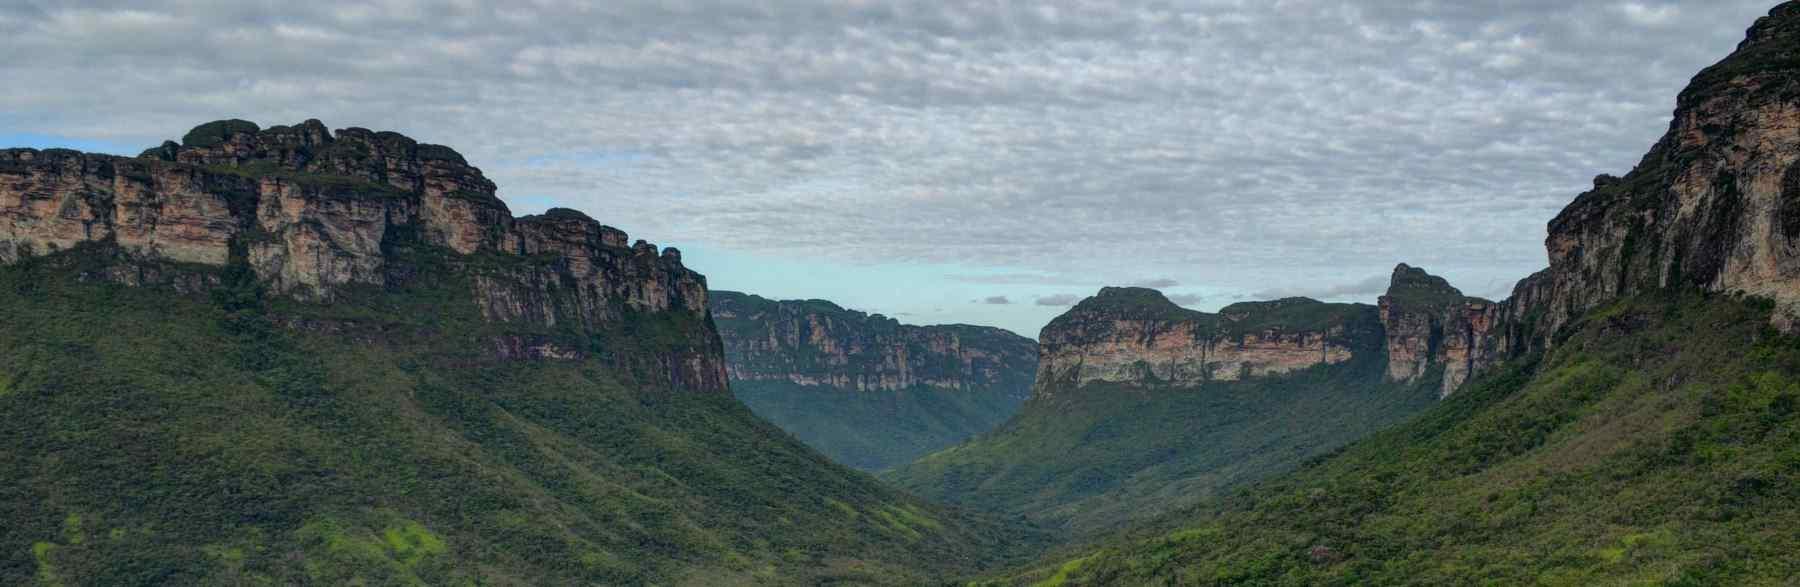 Chapada Diamantina Travel Guide Chapada Diamantina Mountains